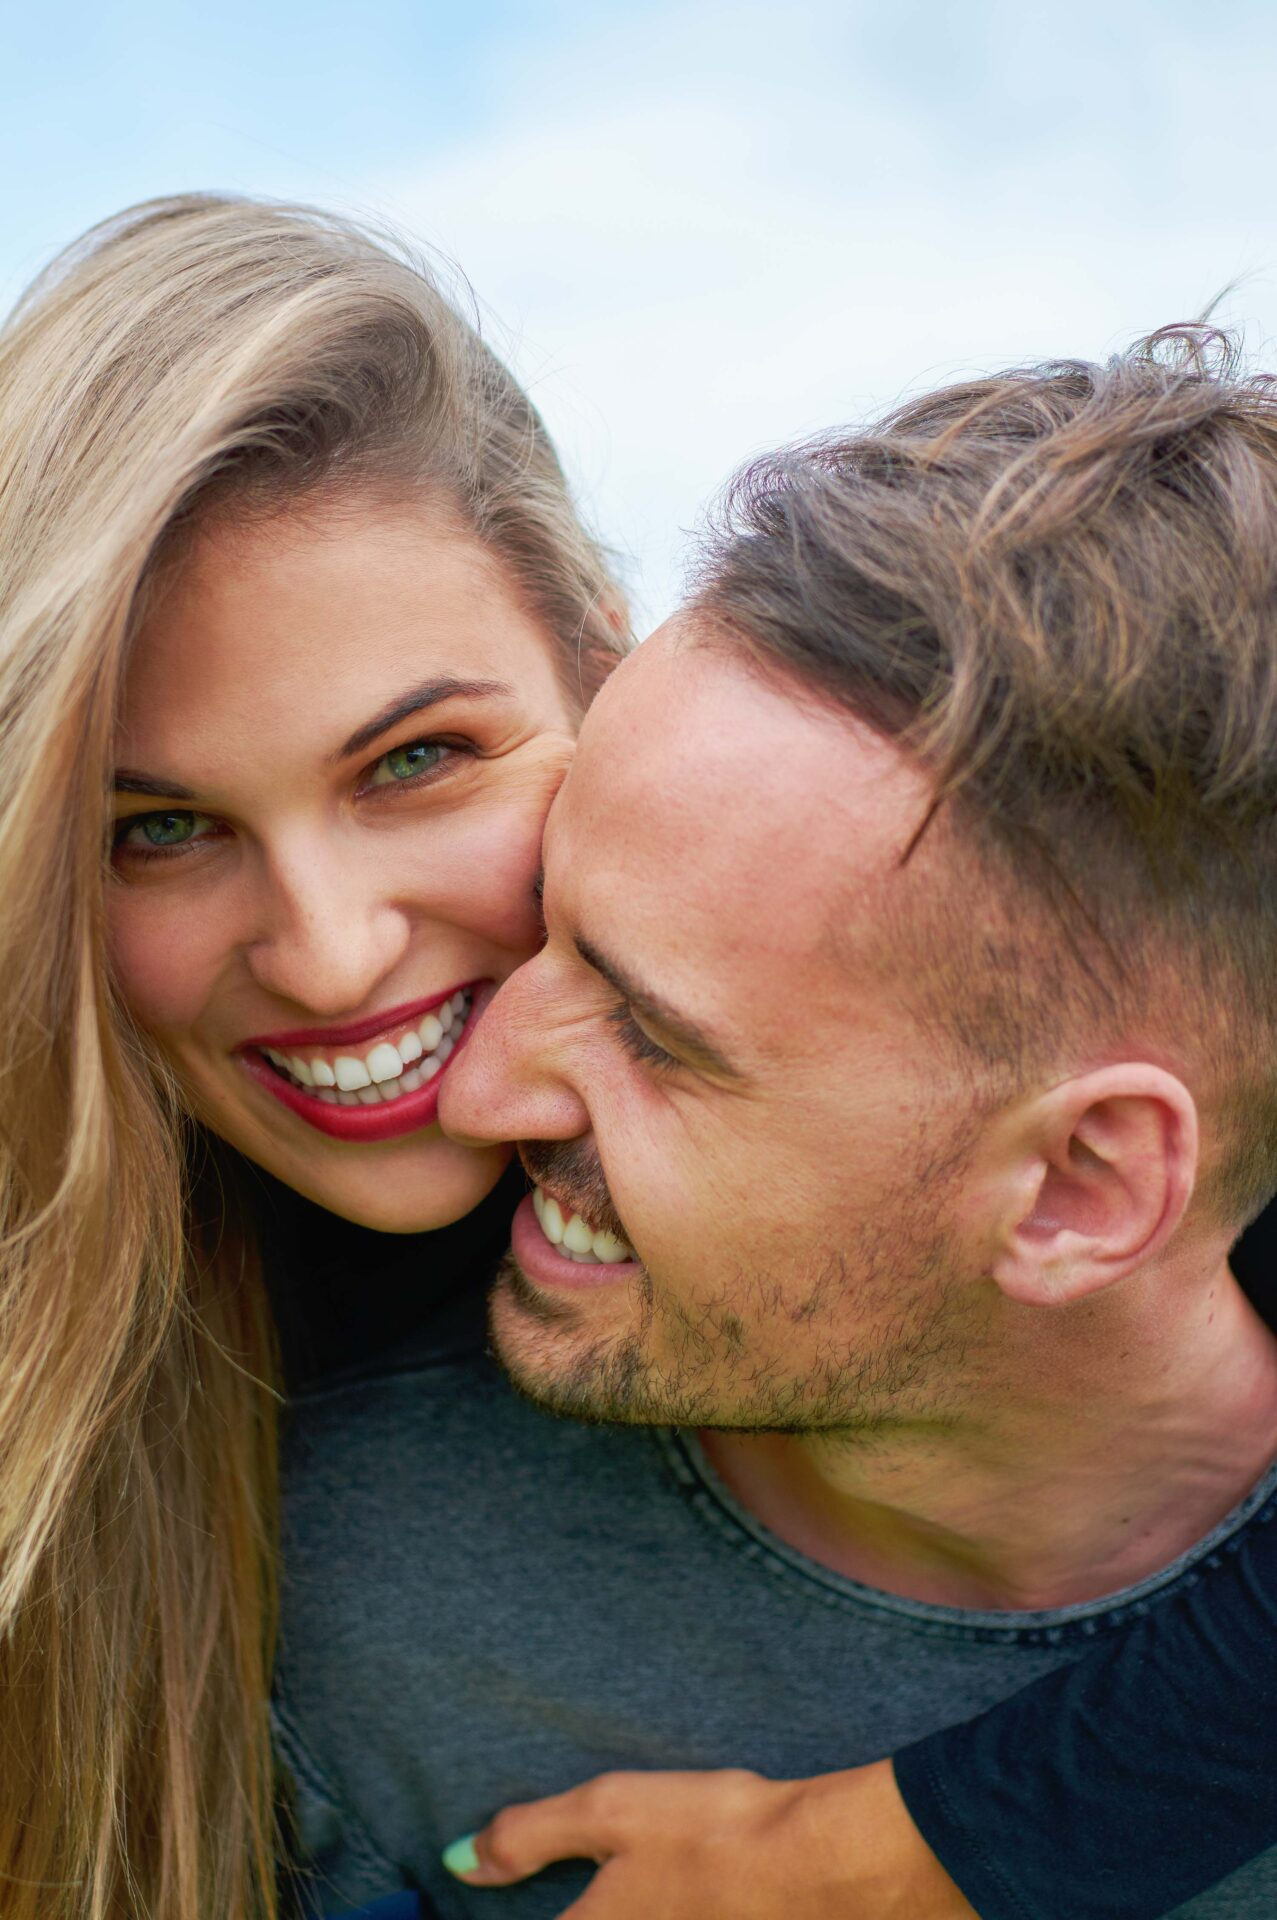 couple portrait photography in zilina slovakia